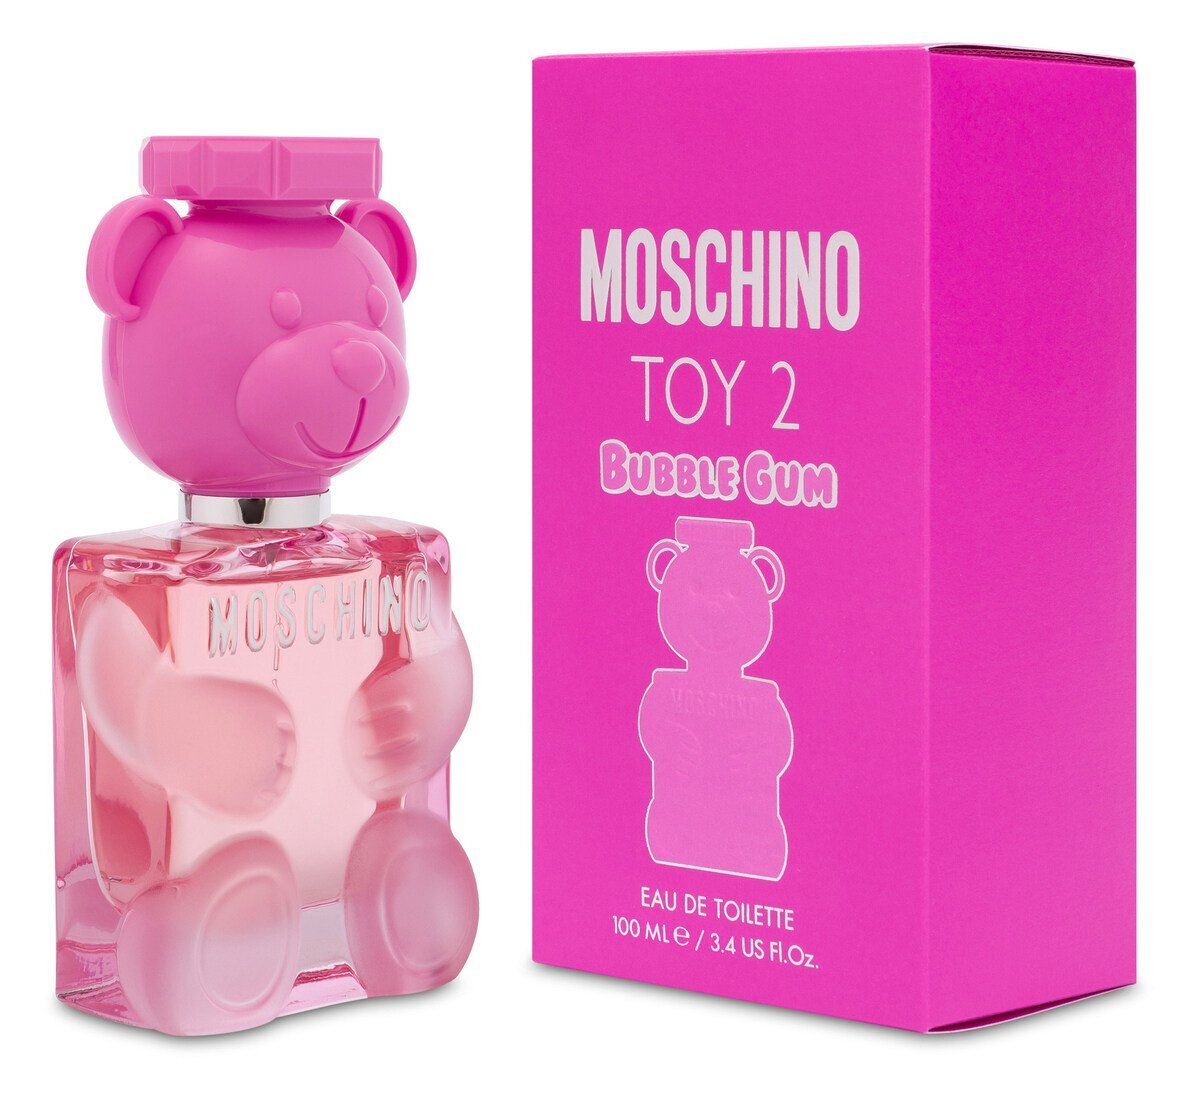 Туалетная вода 100 мл Moschino Toy 2 Bubble Gum